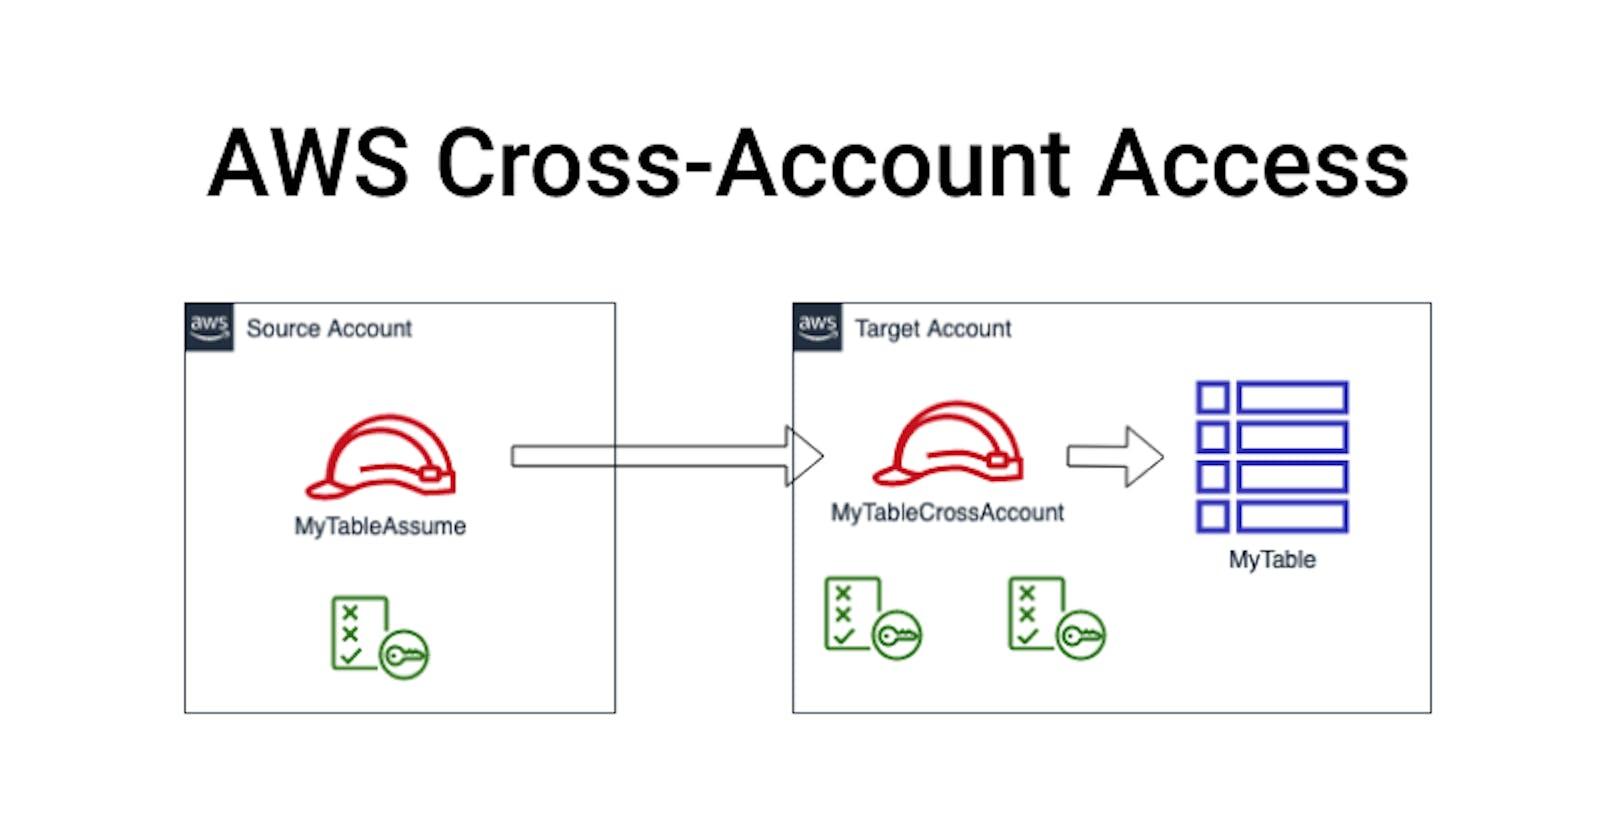 AWS Cross-Account Access